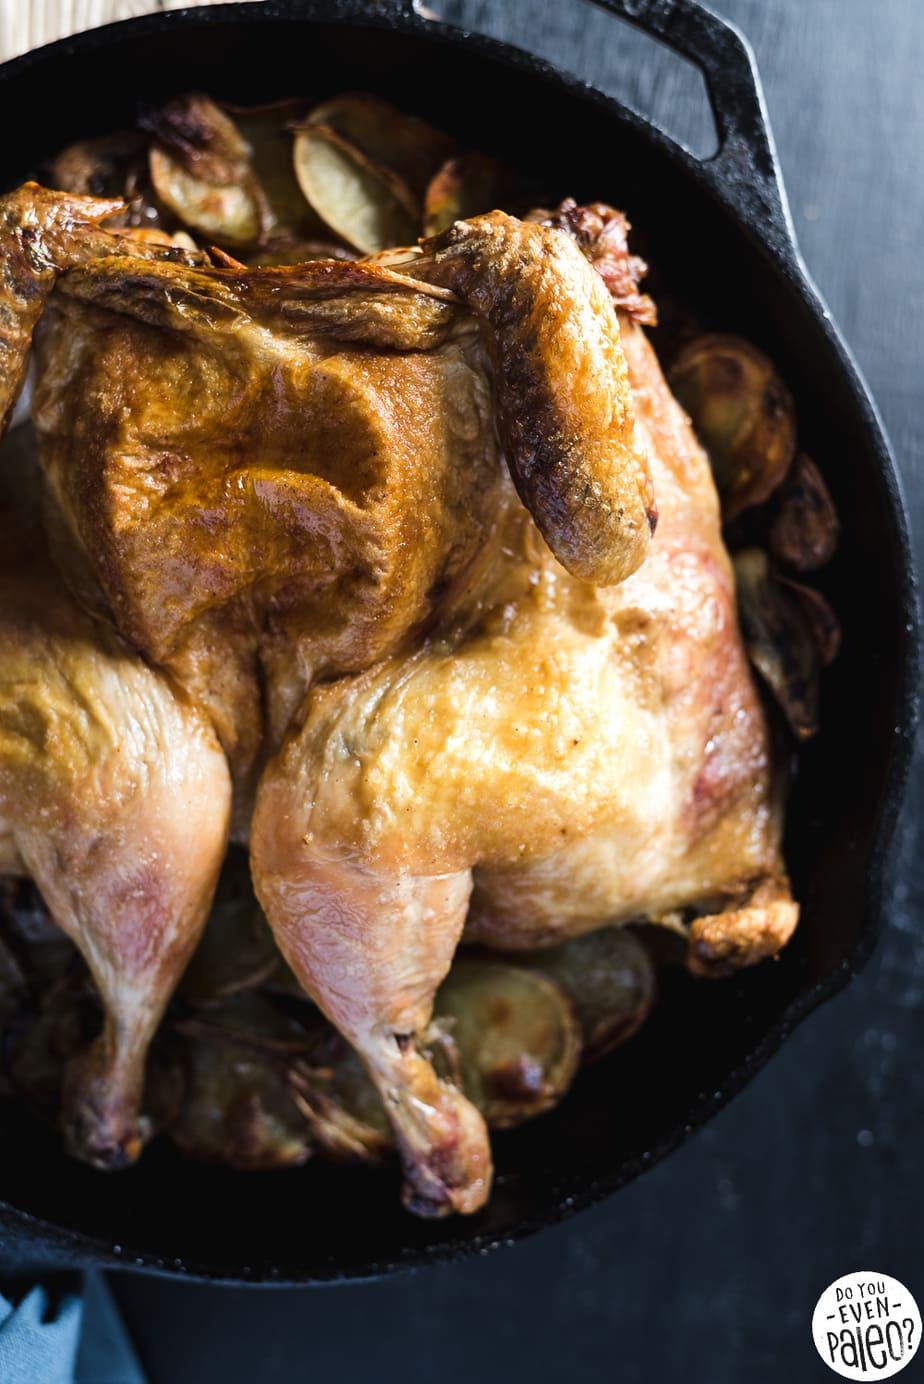 Paleo Spatchcocked Roast Chicken with Potatoes Recipe | DoYouEvenPaleo.net